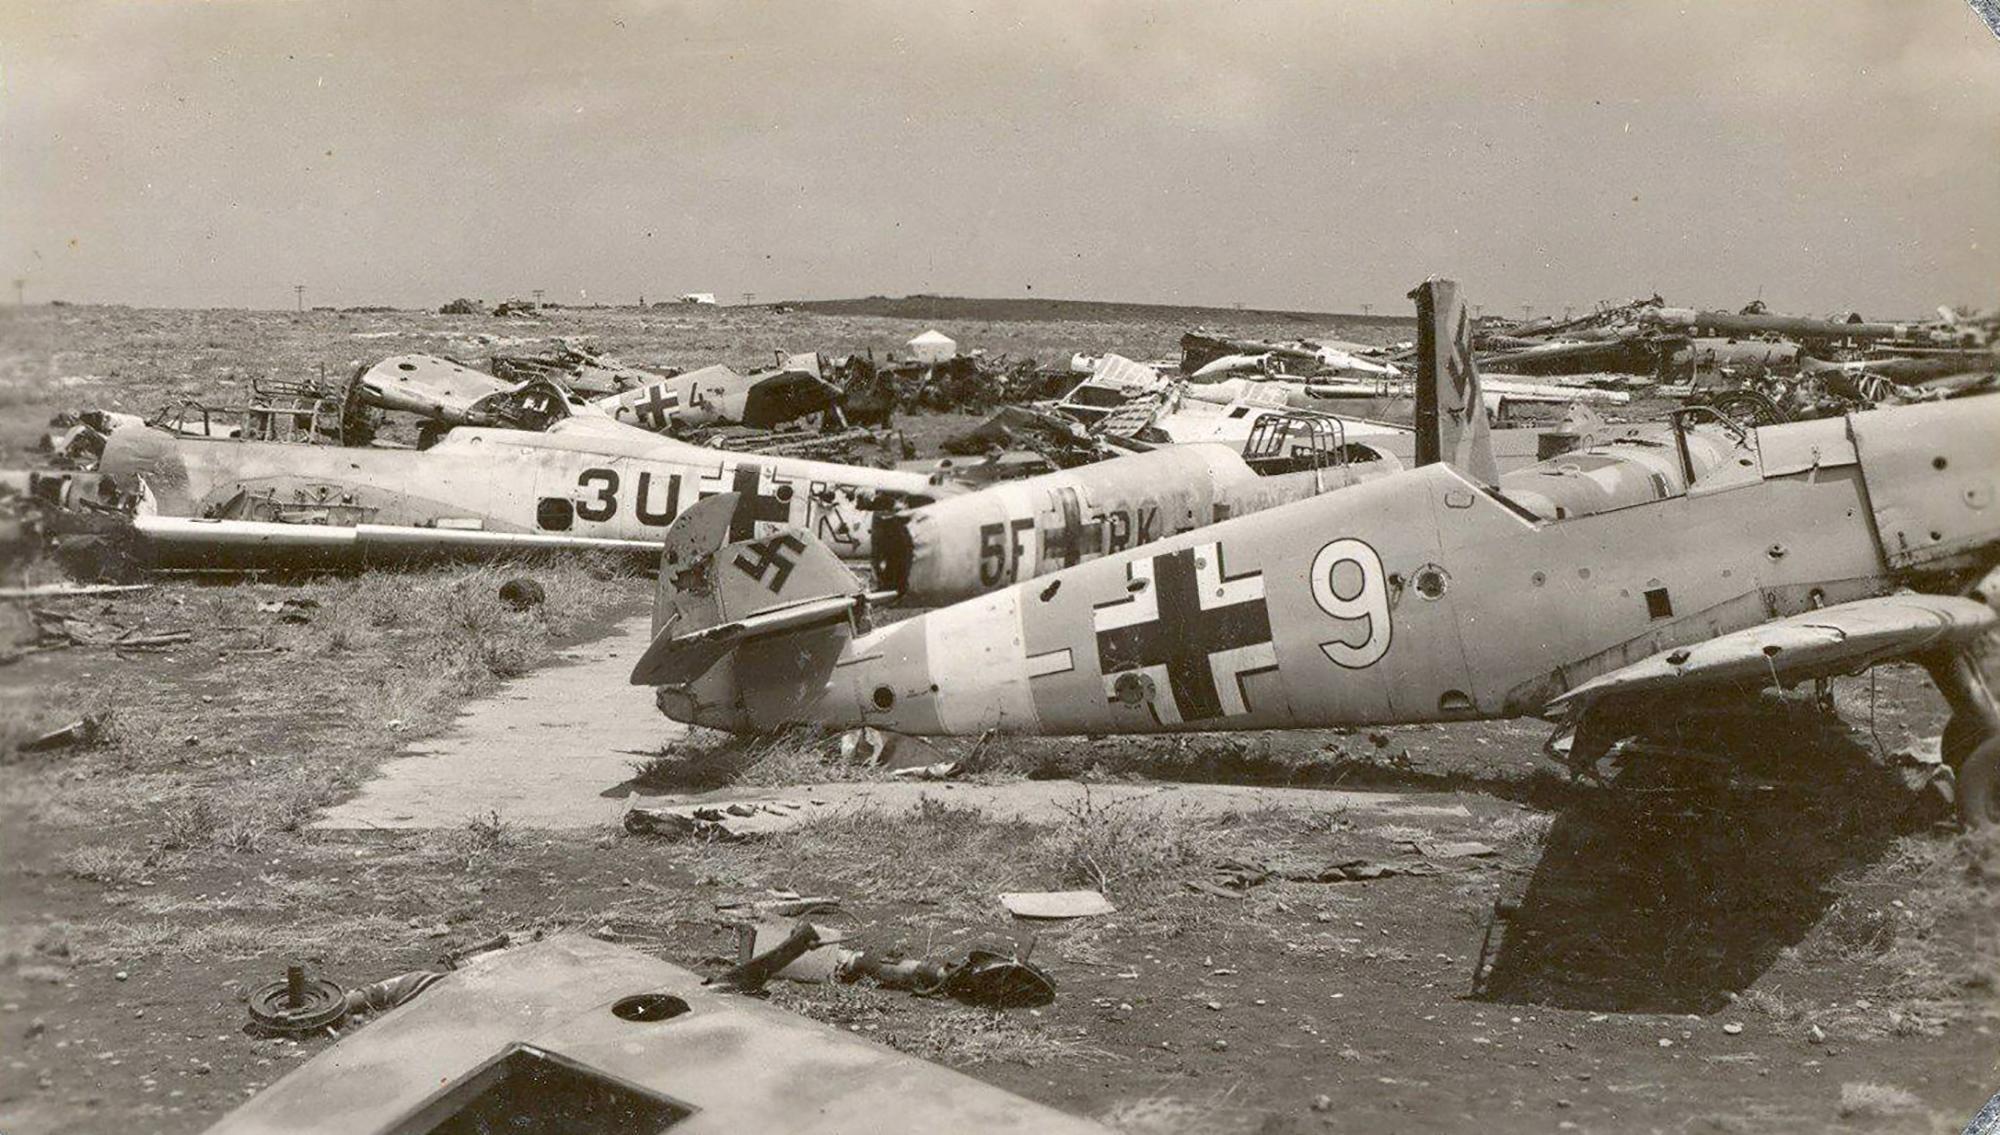 Messerschmitt Bf 109F4Trop 8.JG27 Black 4 abandoned airframe foreground Derna Nov 1942 ebay1